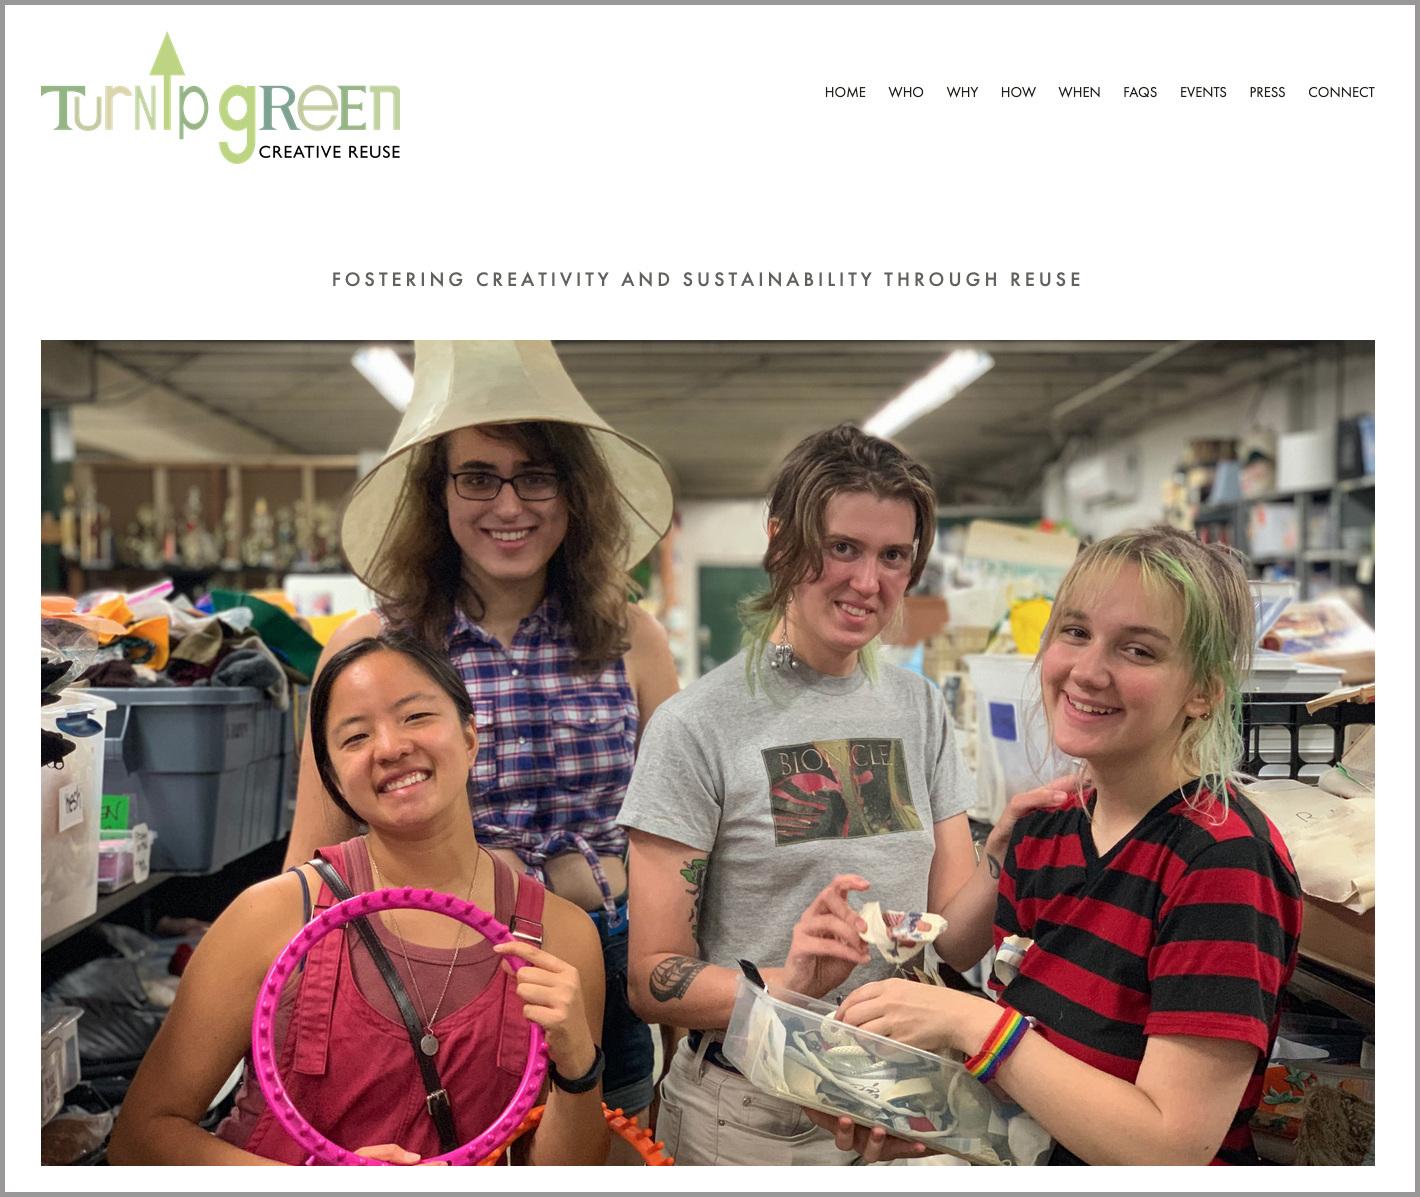 Complete overhaul of Turnip Green Creative Reuse's web site.